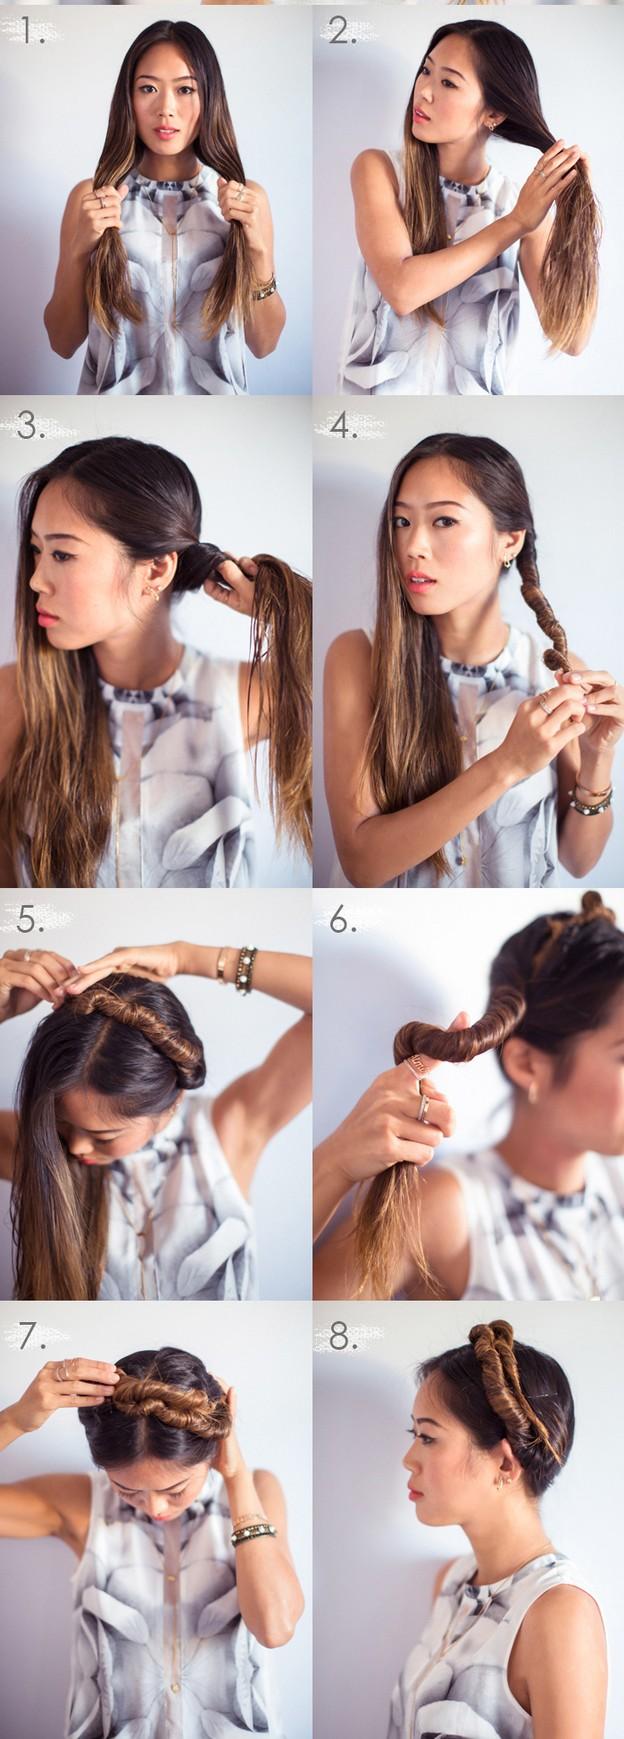 krullen tips 5